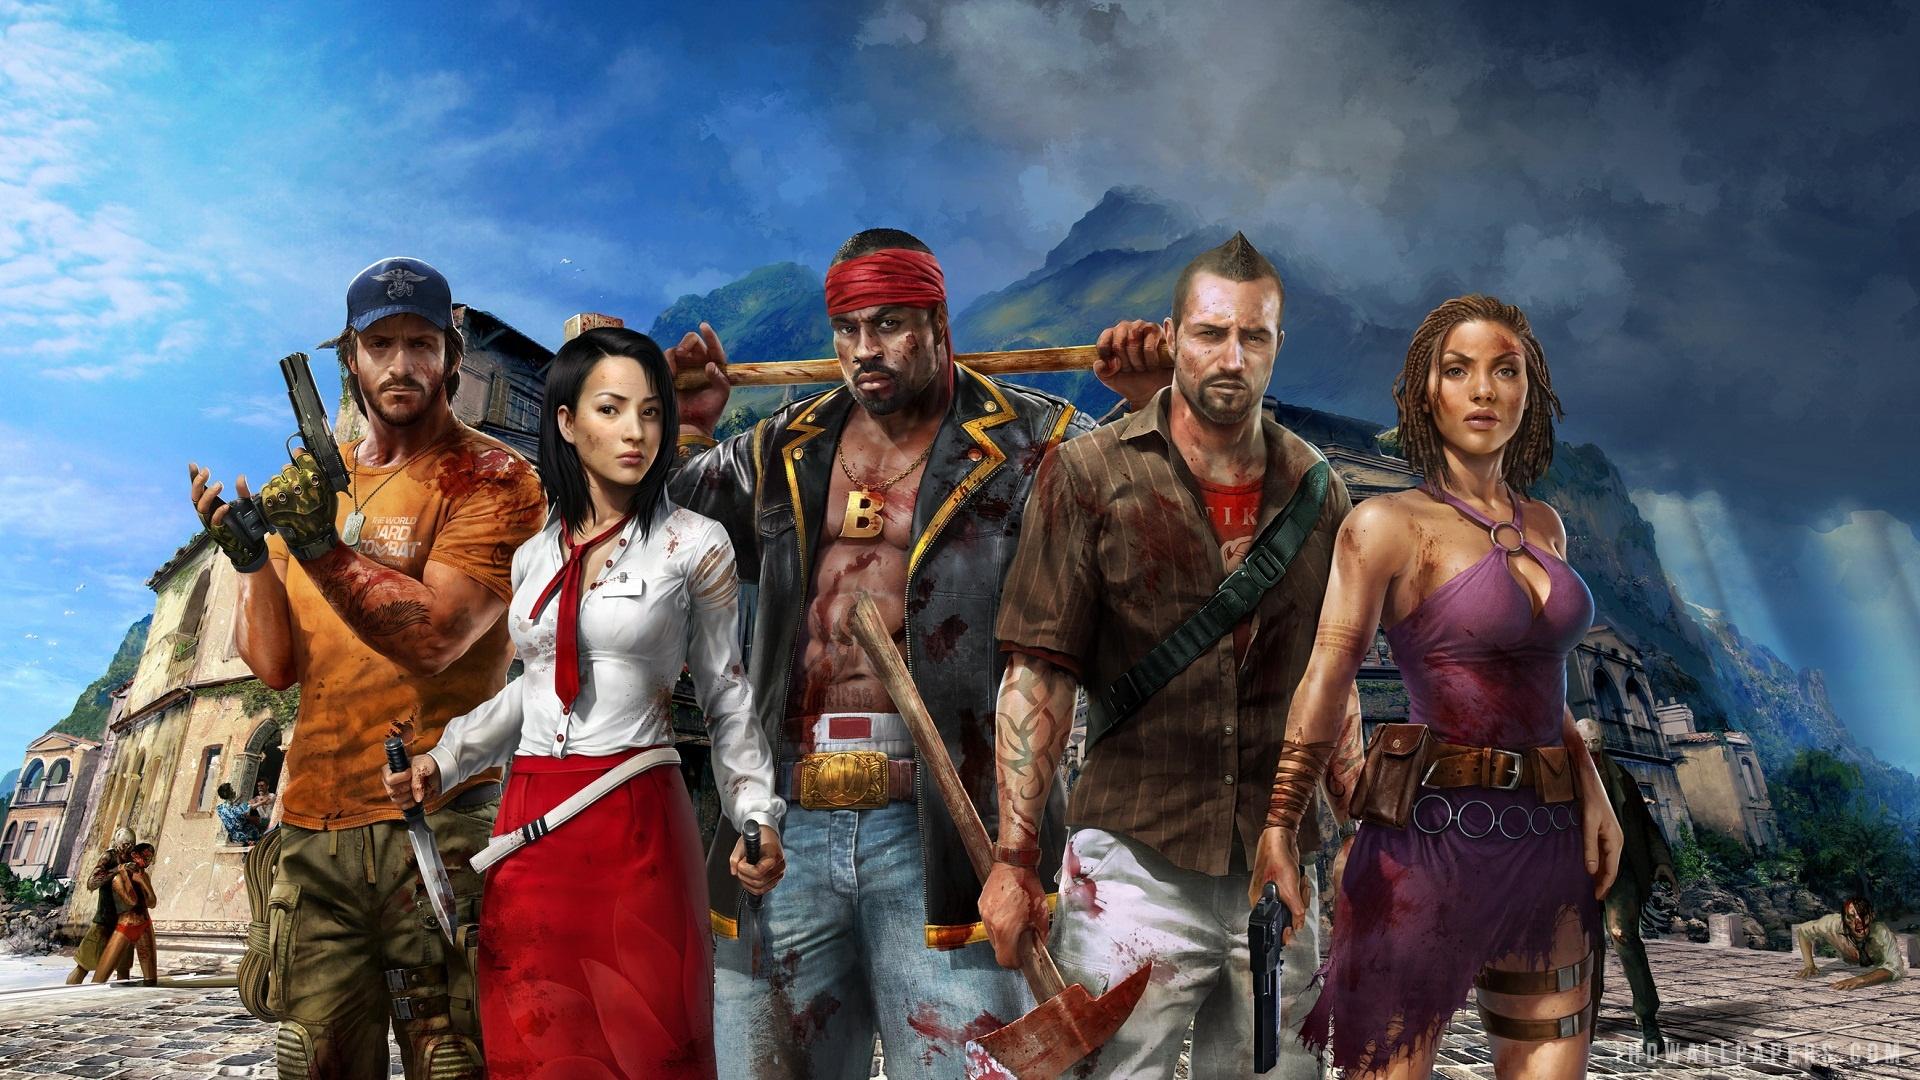 Dead Island Riptide Video Game HD Wallpaper - iHD Wallpapers